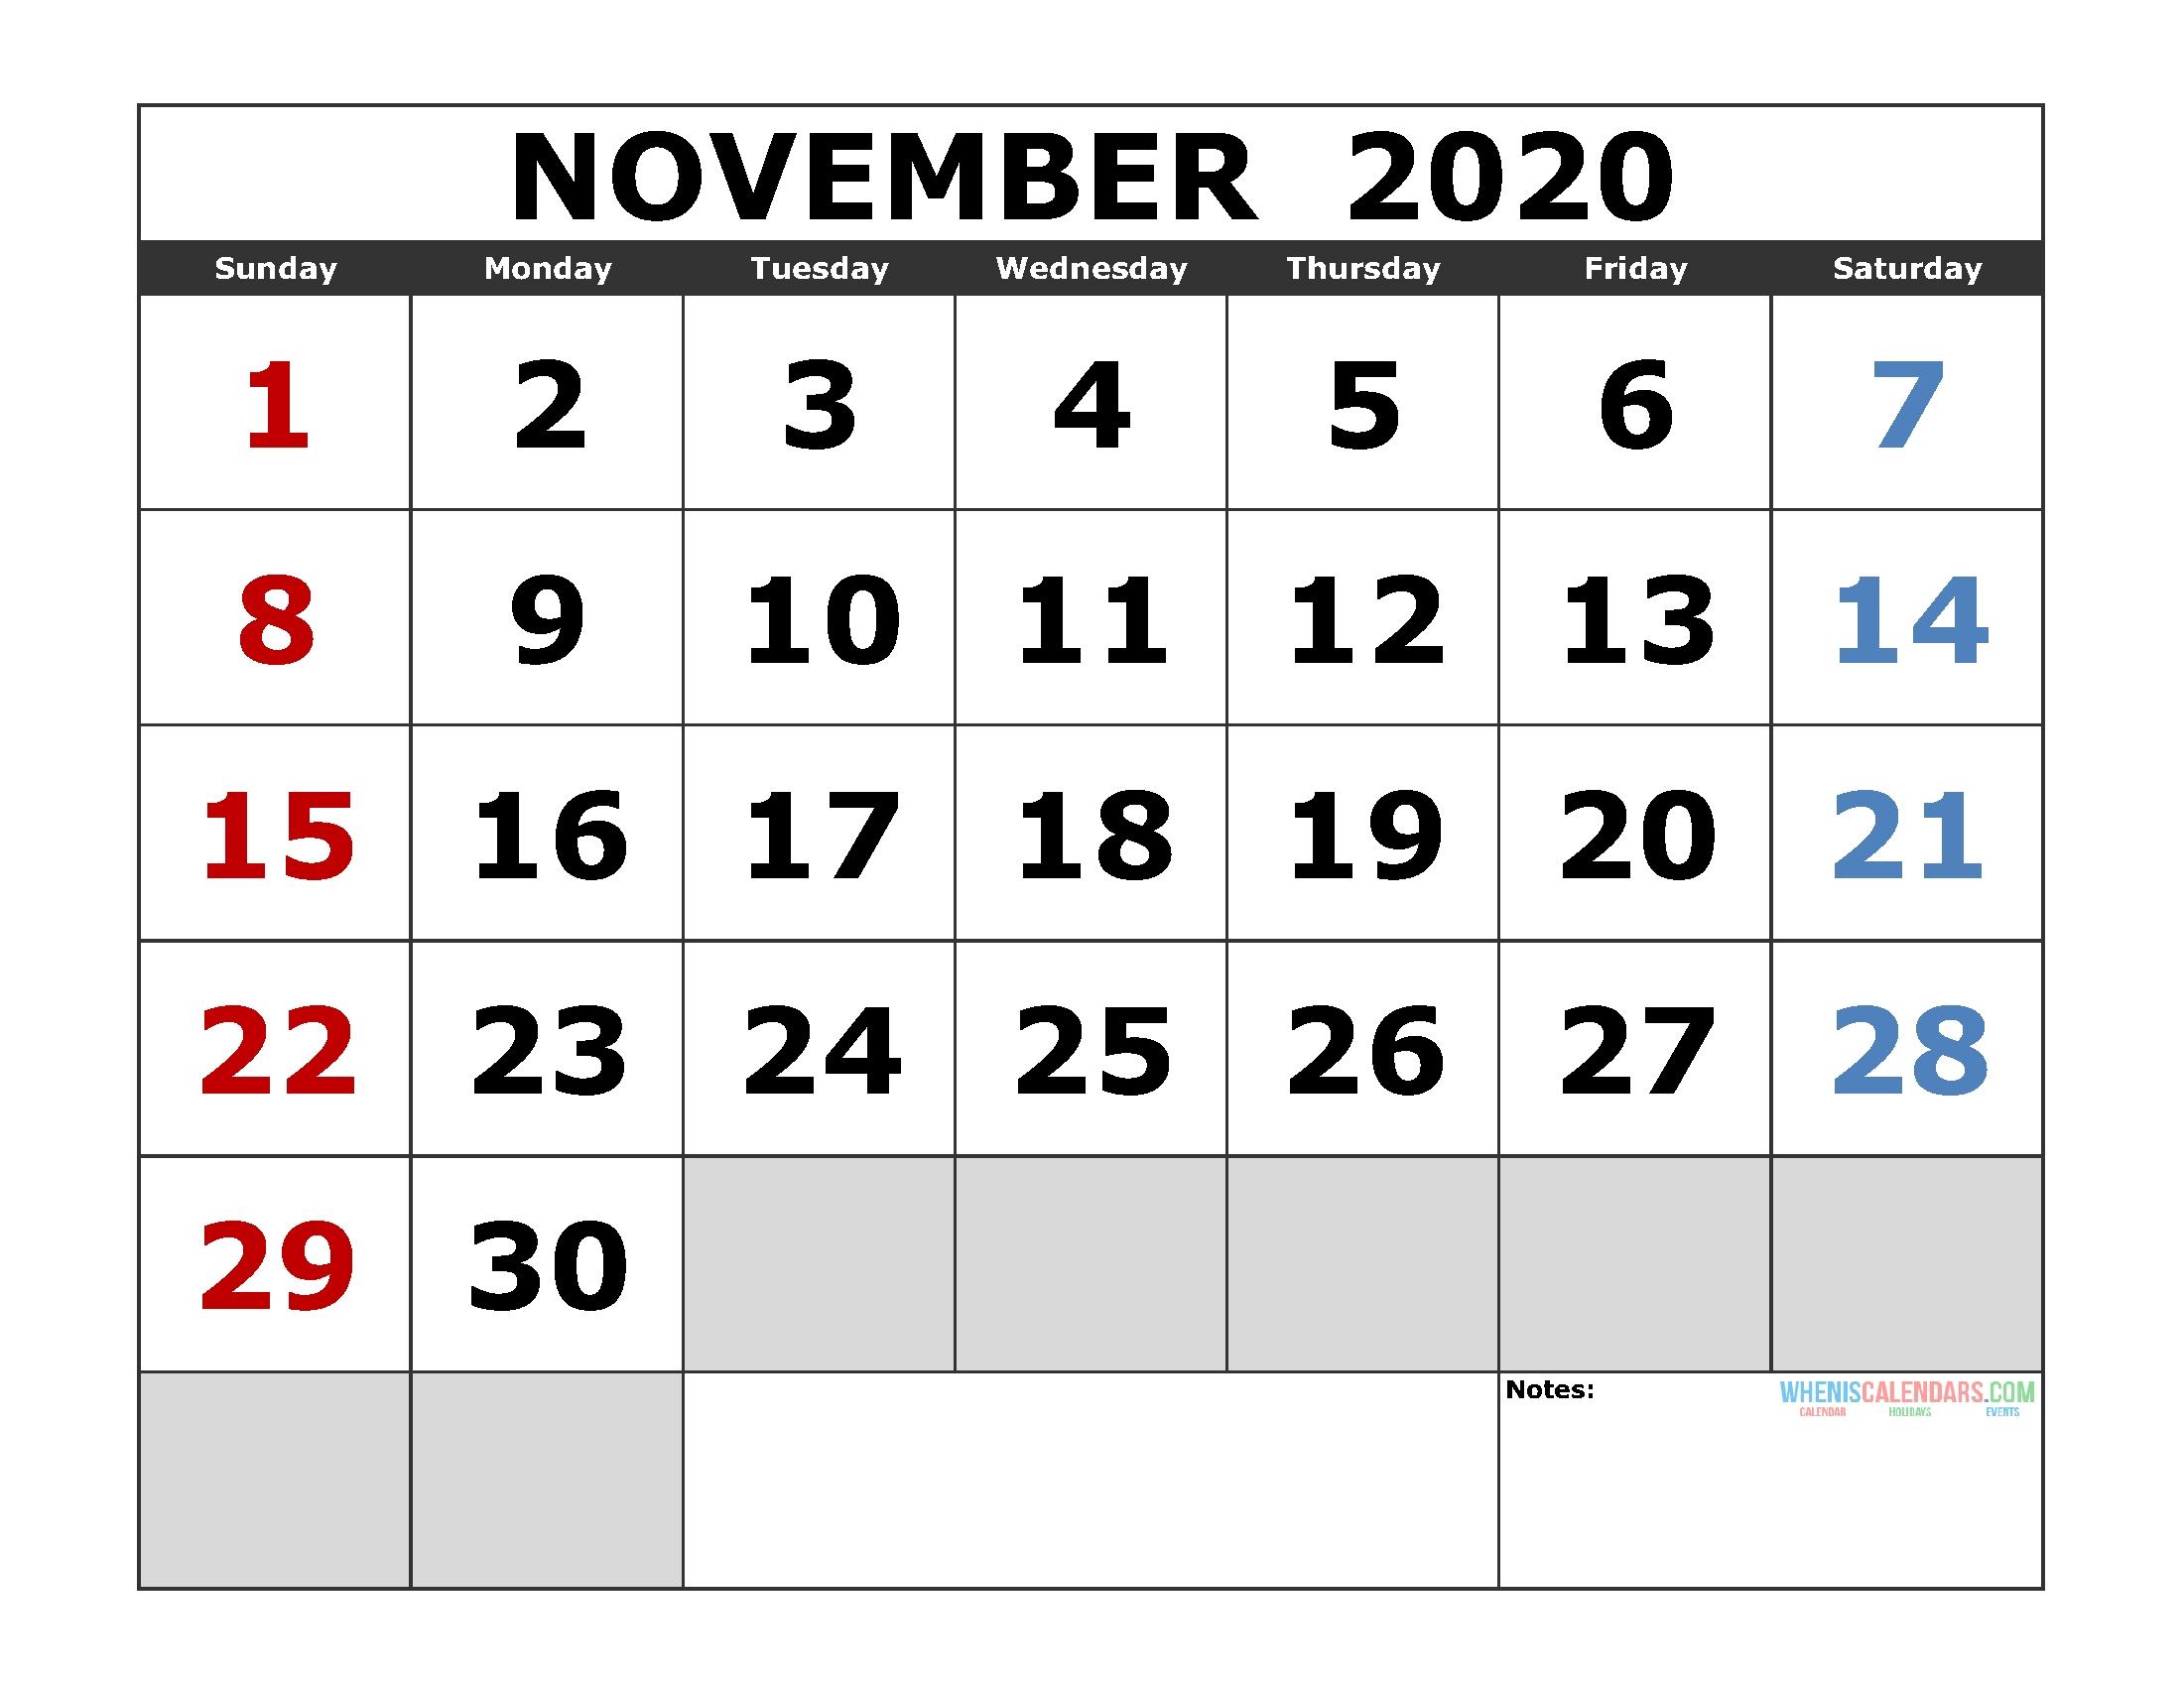 November 2020 Printable Calendar Template Excel, Pdf, Image-2020 Calendar With Jewish Holidays Printable